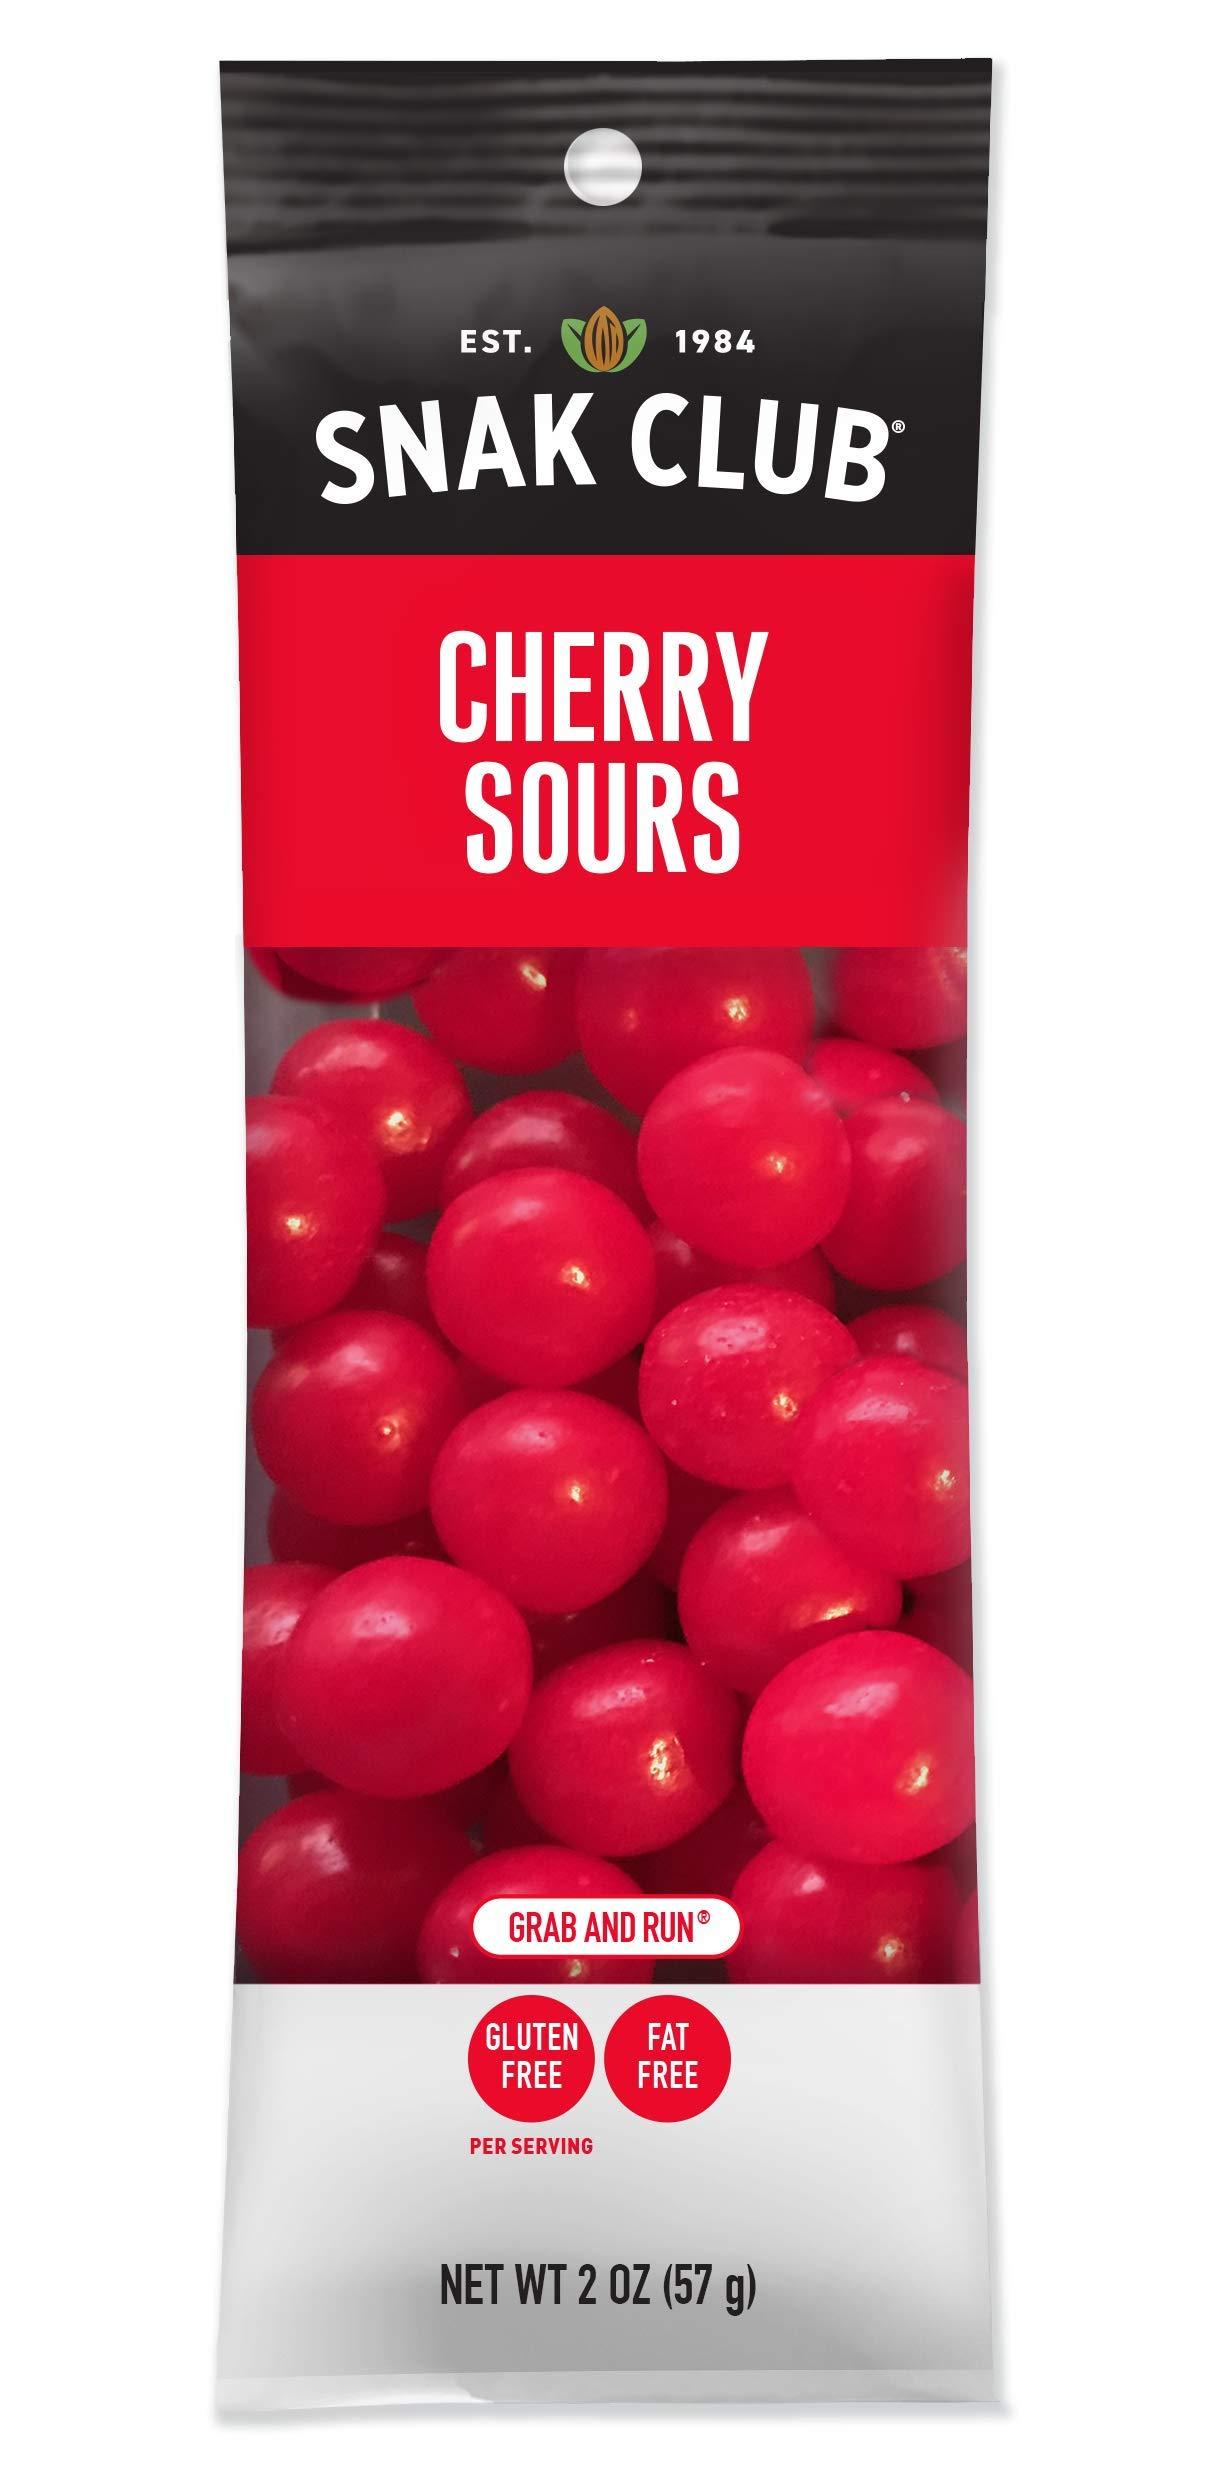 Snak Club Cherry Sours, 2-Ounces, 12-Pack by Snak Club